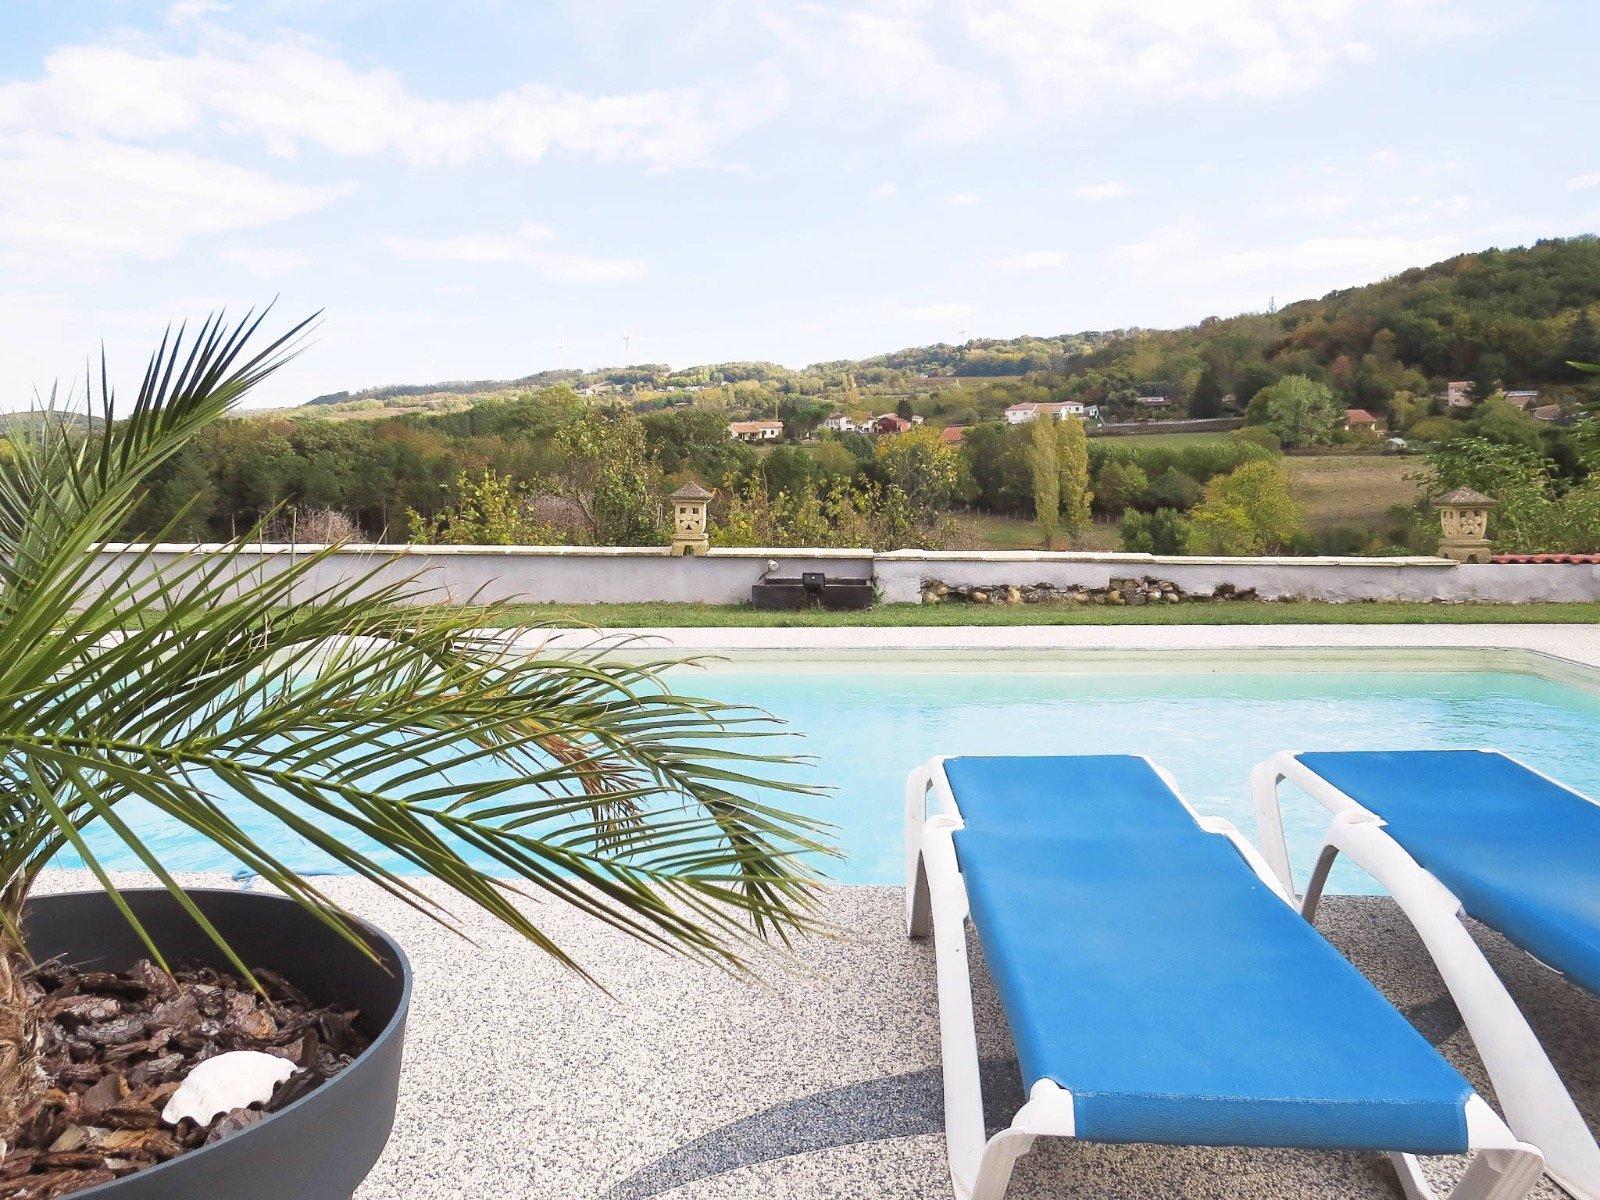 Vente Villa 330 M² Avec Piscine - Laveyron tout Piscine Cournonterral